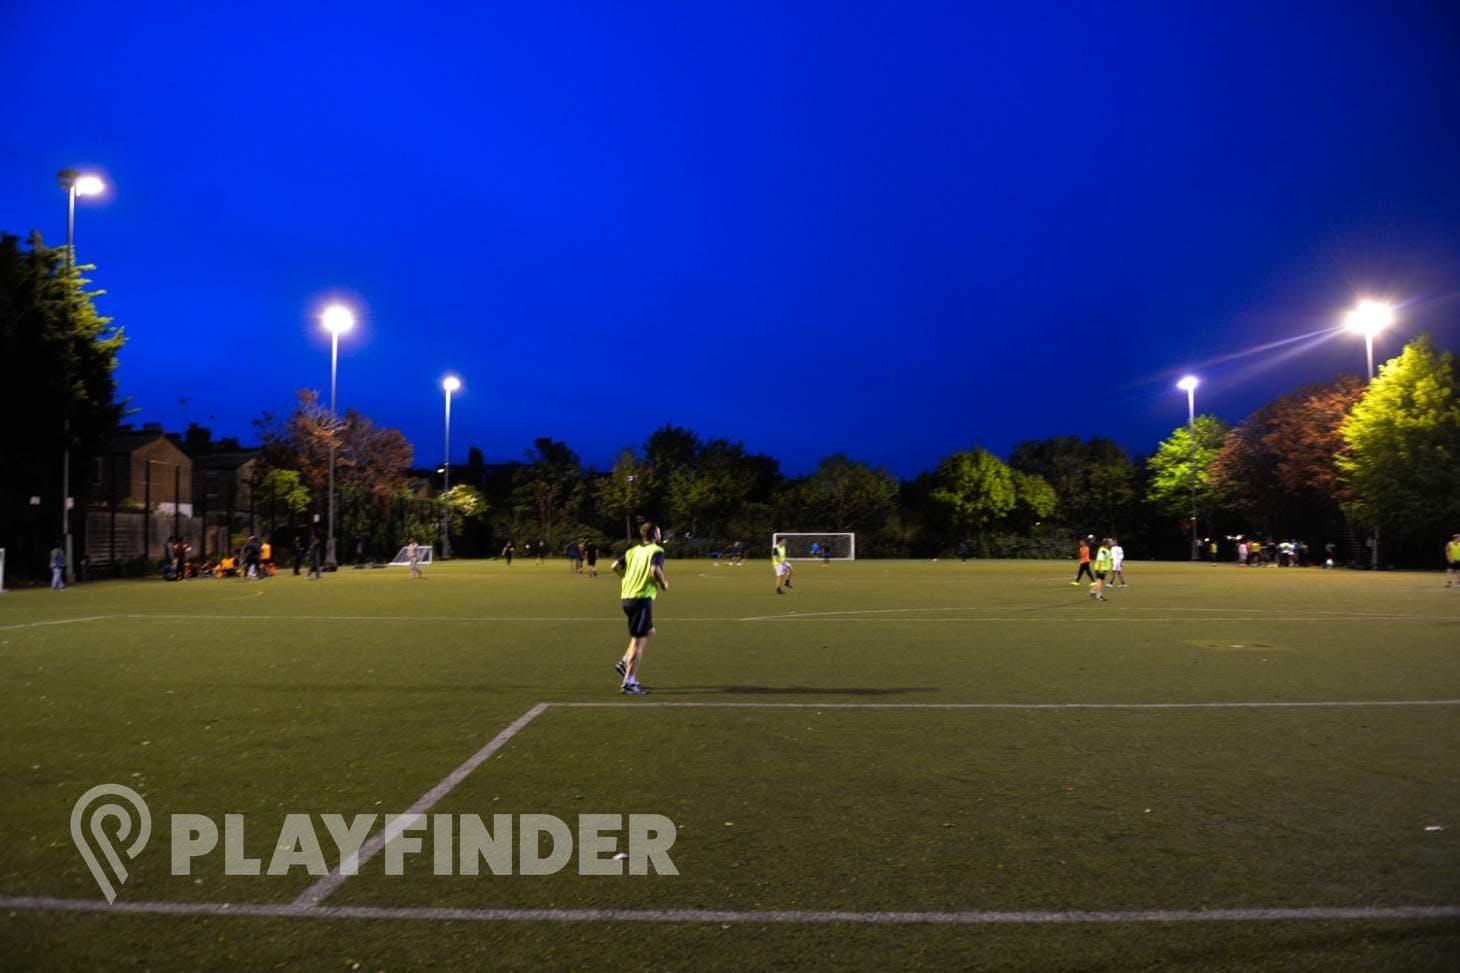 Whittington Park 11 a side | 3G Astroturf football pitch